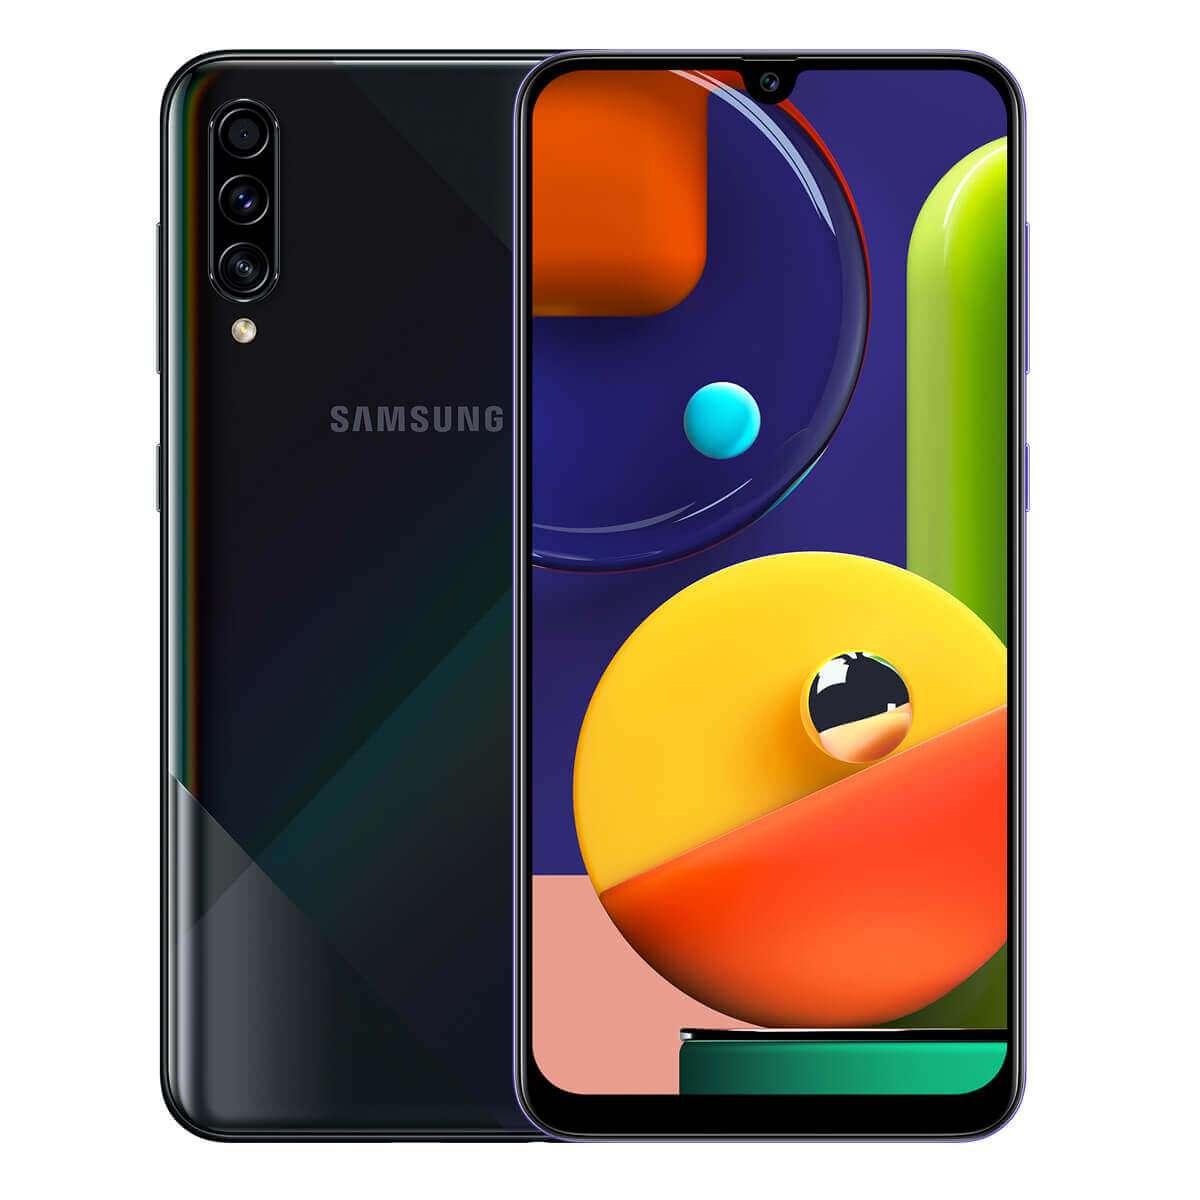 Samsung Galaxy A50s Dual Sim,128 GB, 6GB RAM,4G LTE, Prism Crush Black